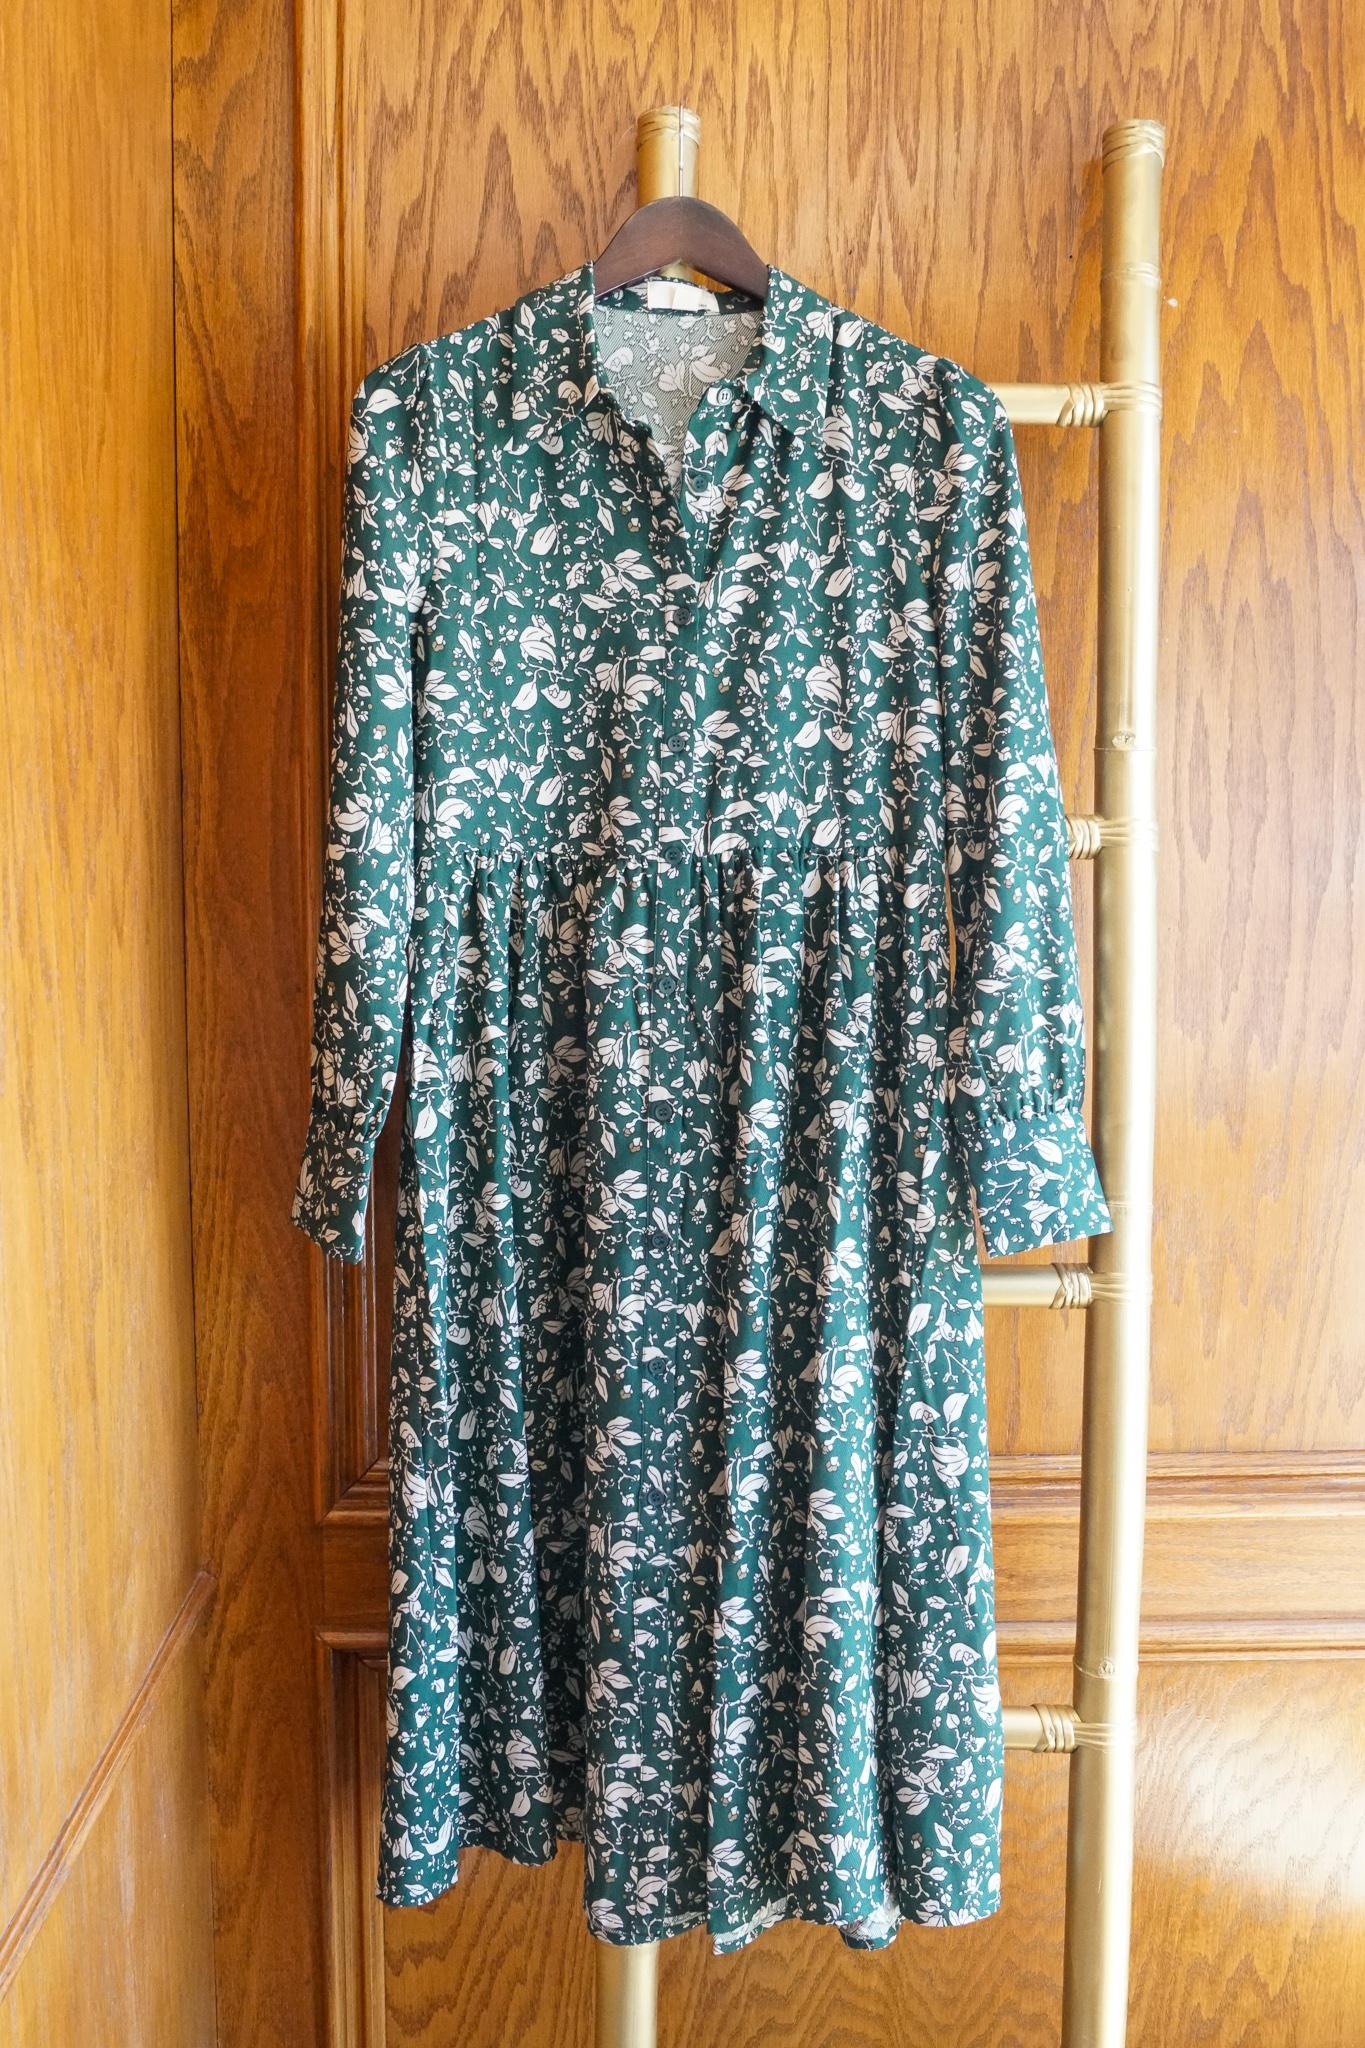 Korner Floral Dress $99- XS, S, M, L